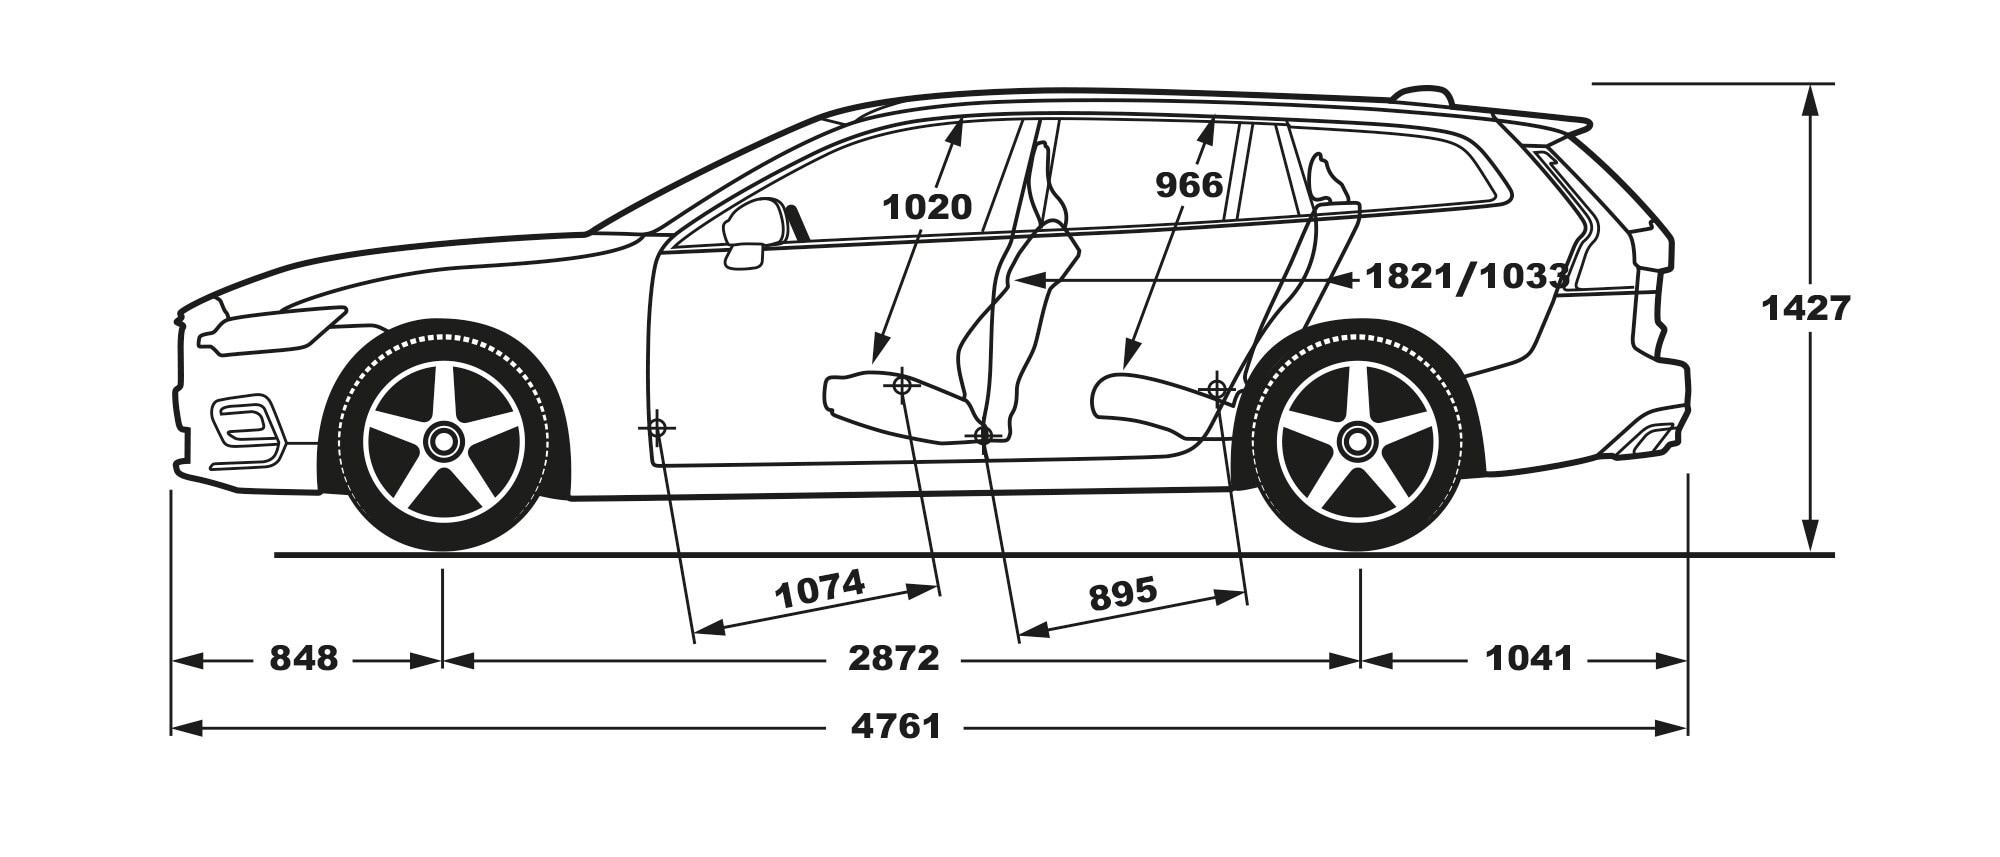 Volvo v60 interior dimensions